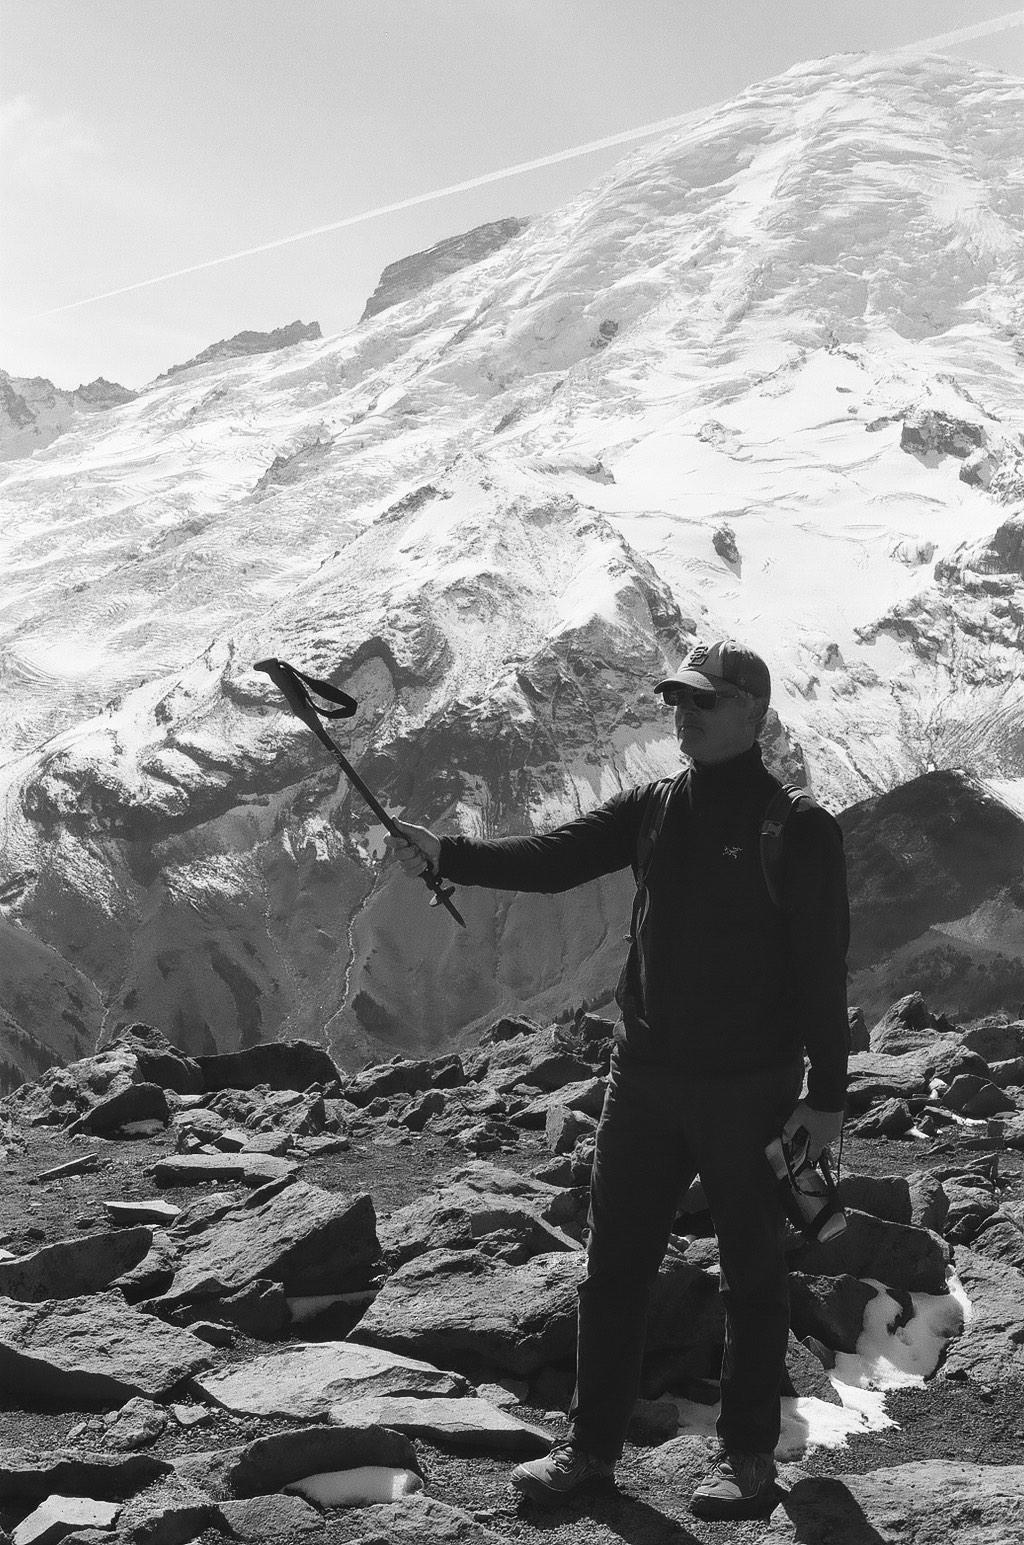 35mm film photography Tri-X 400 Nikon F2 - Atop 3rd Burroughs Peak Mount Rainier National Park